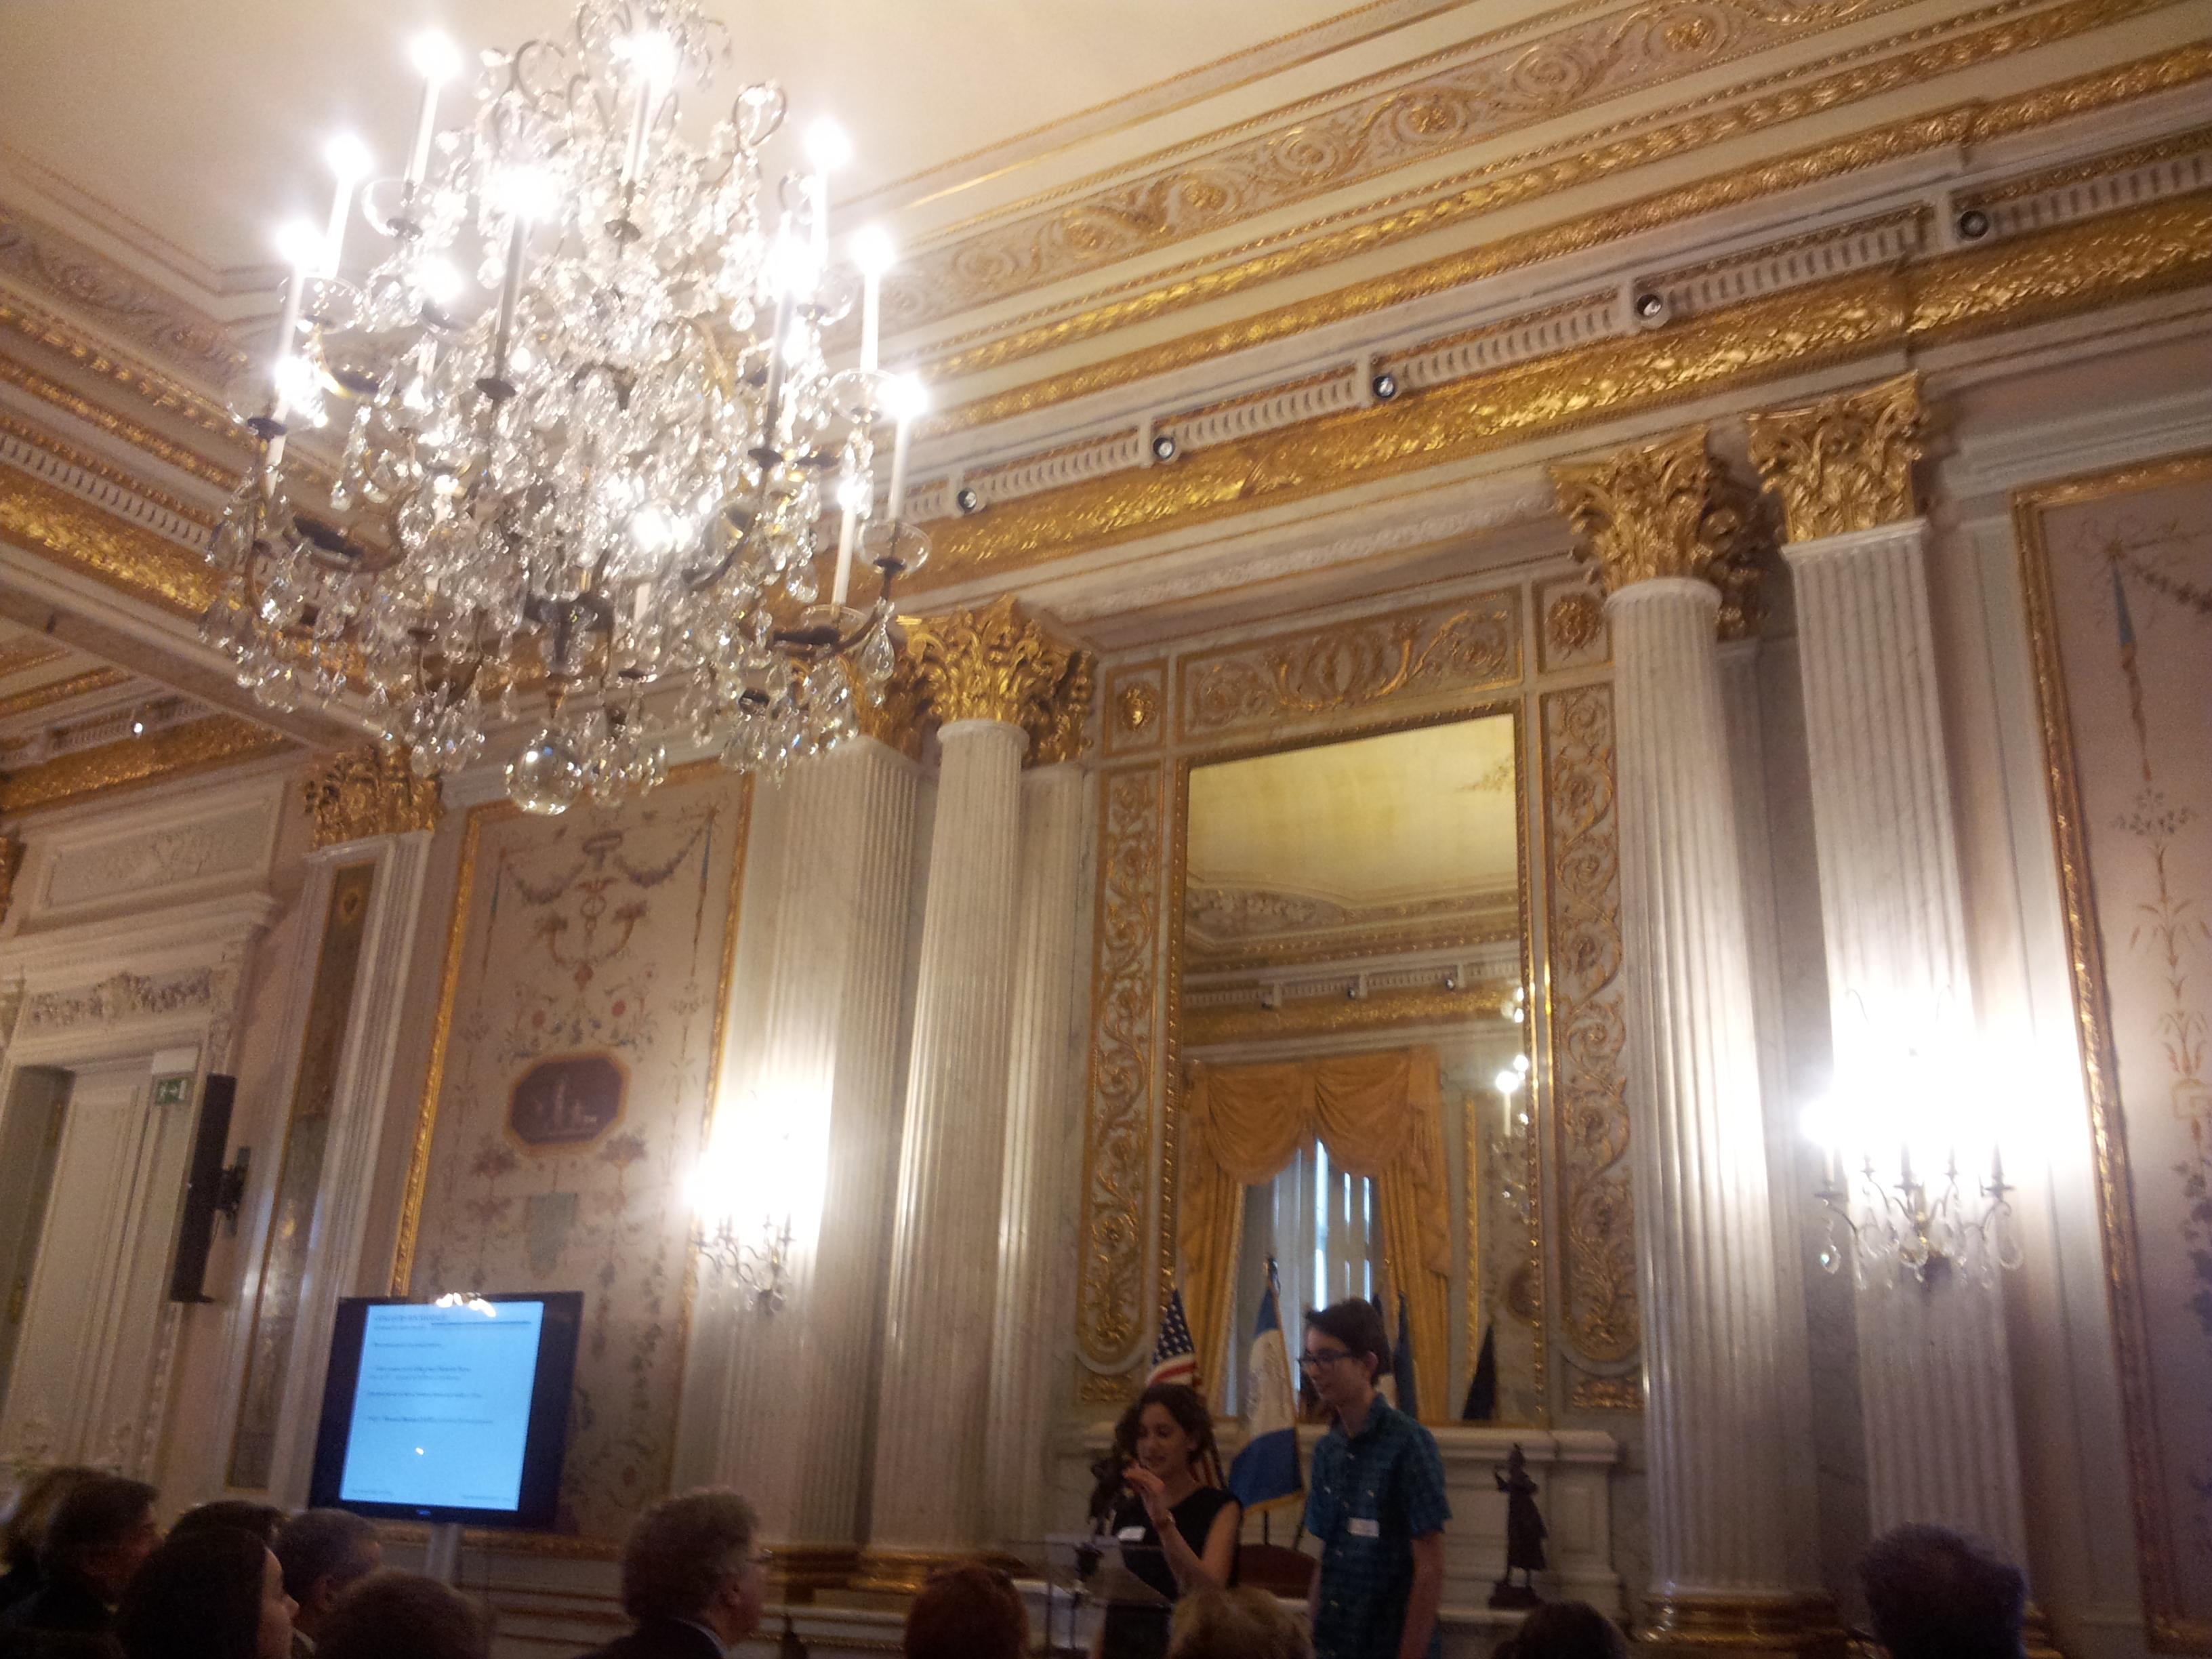 Concours Rochambeau - Hotel Talleyrand & Concours Rochambeau